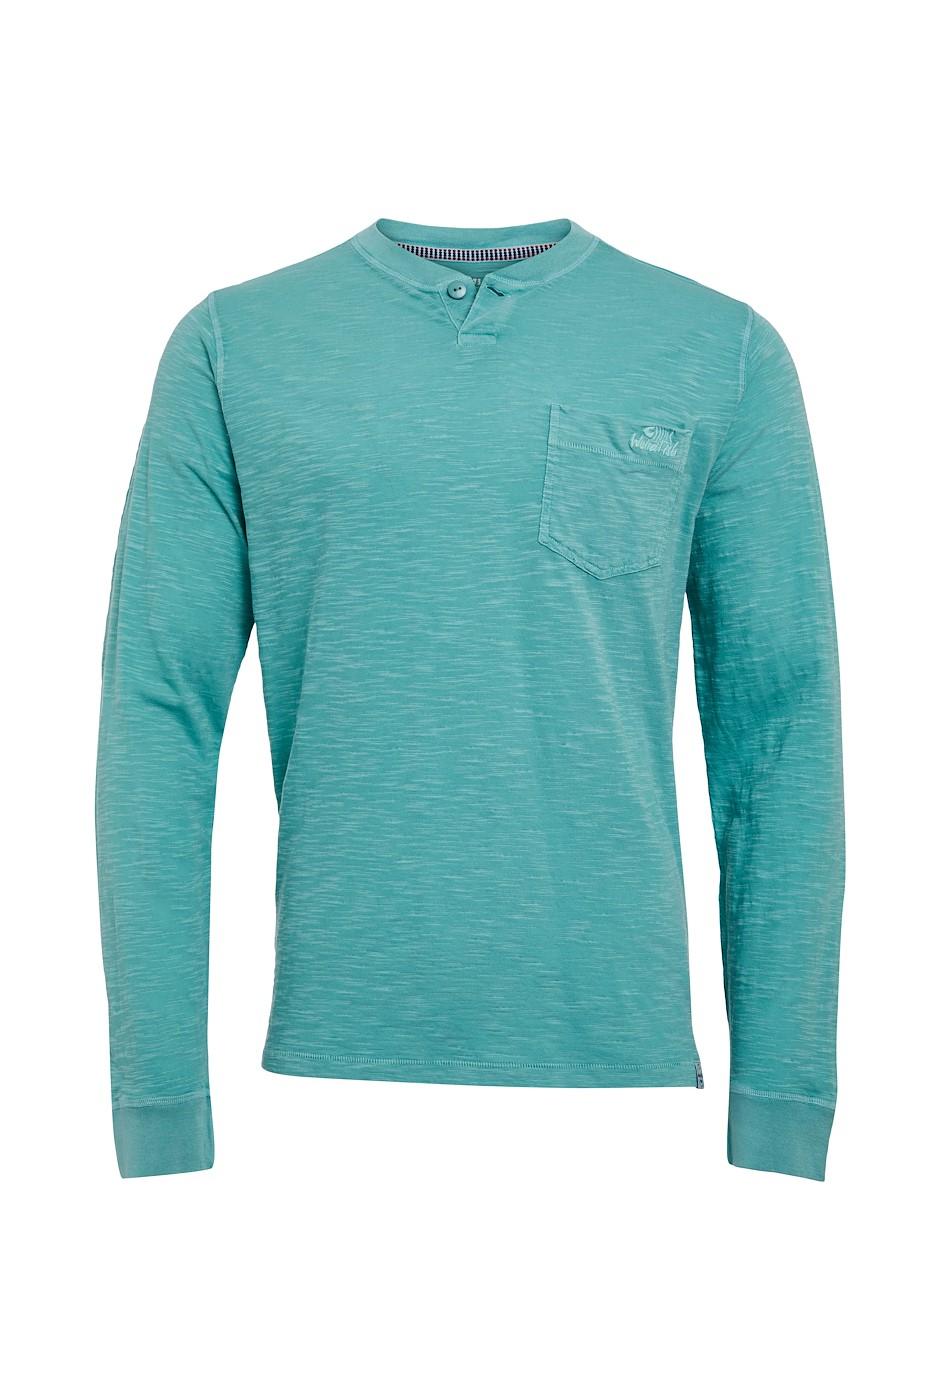 Walken Organic Cotton Henley T-Shirt Washed Teal